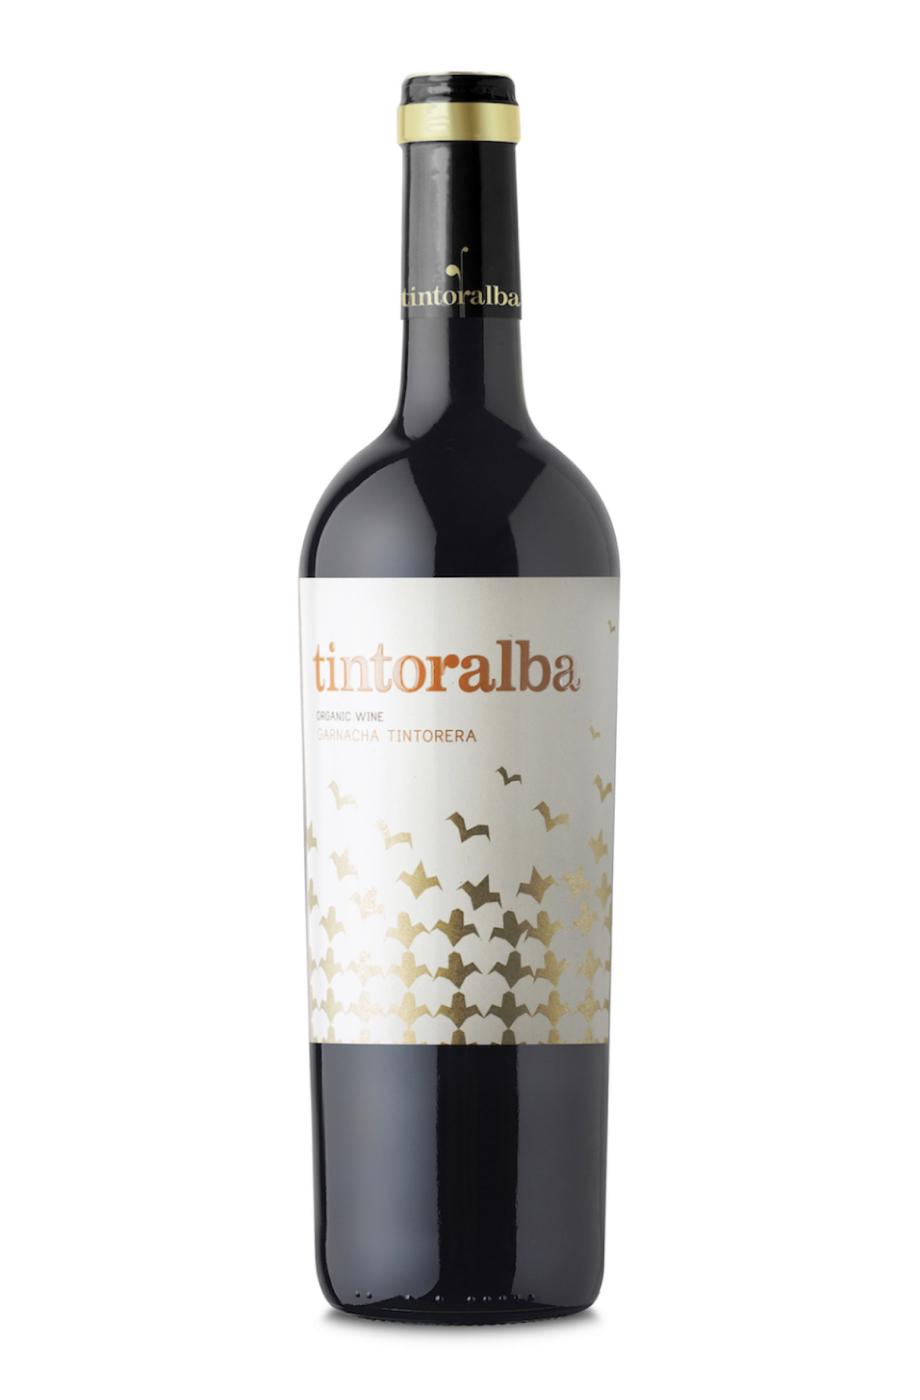 Tintoralba Ecologico Crianza | Tintoralba - Winexfood